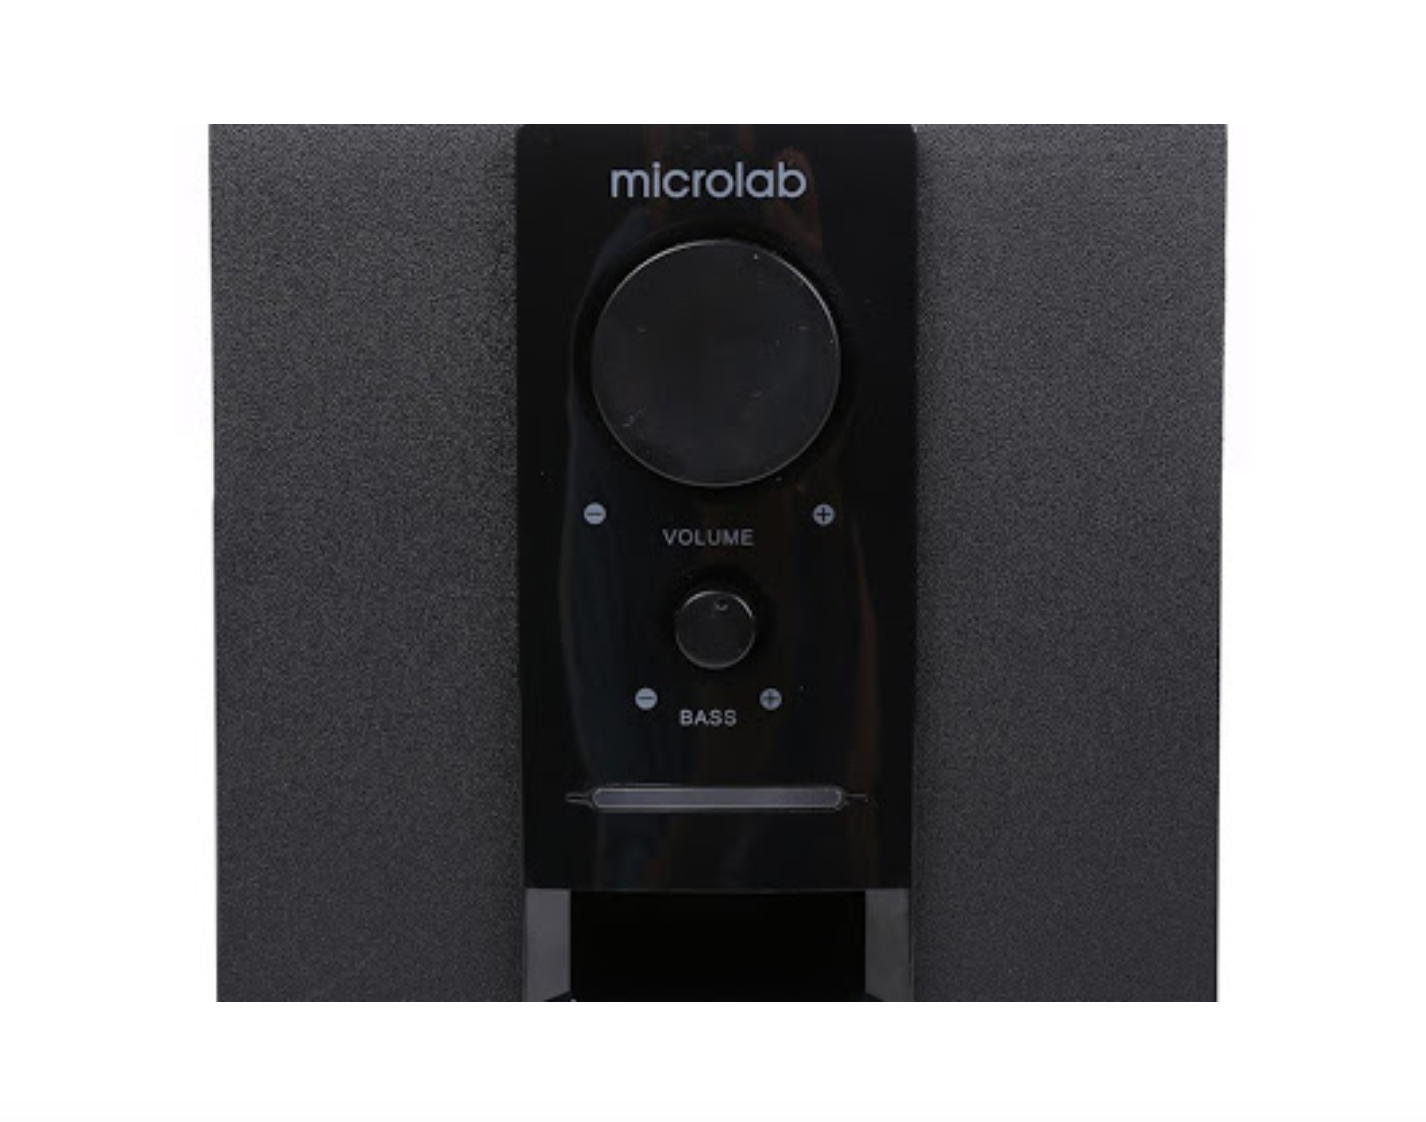 loa vi tính microlab m106